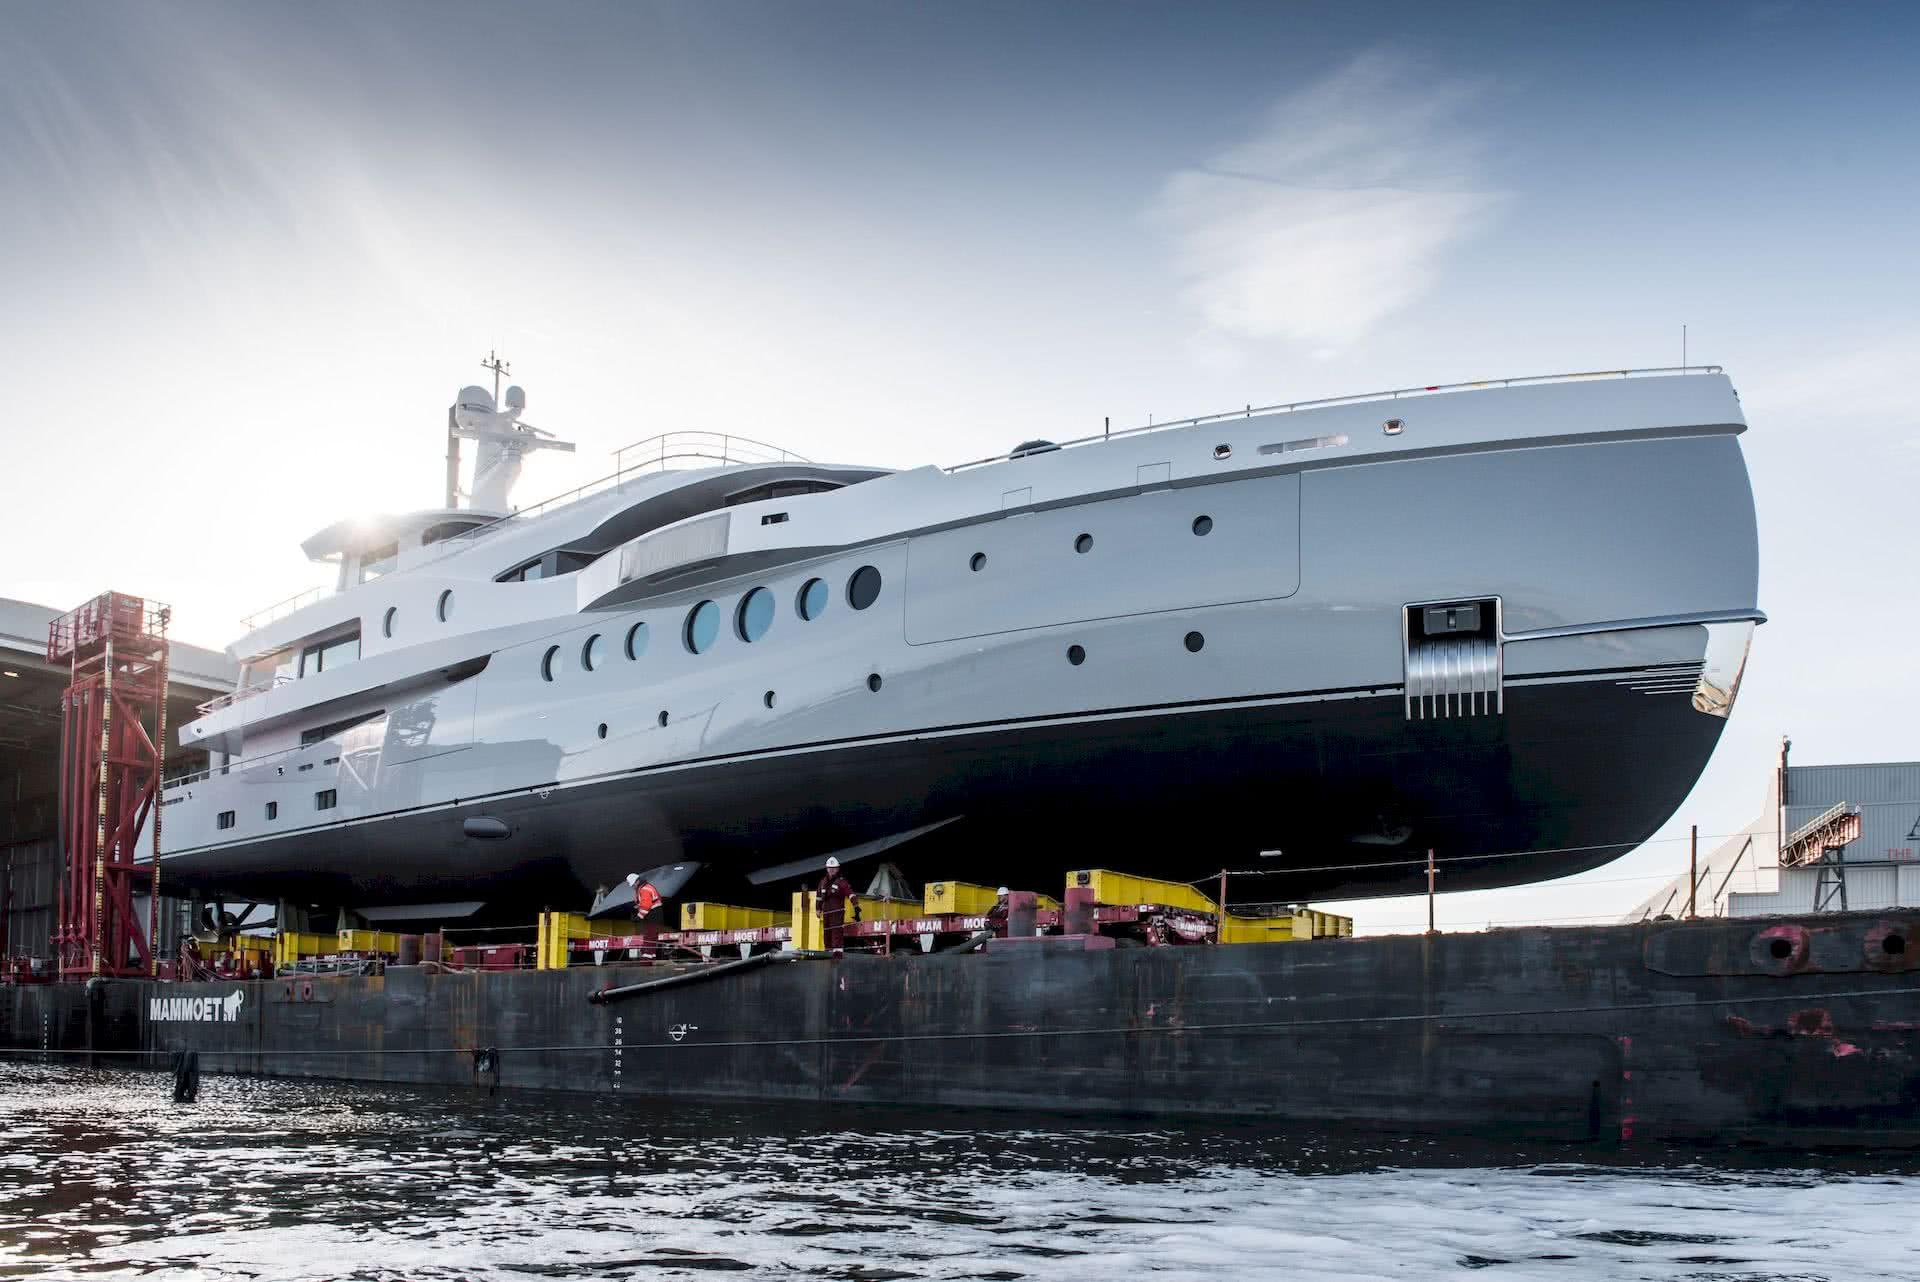 Amels 206 Motor Yacht